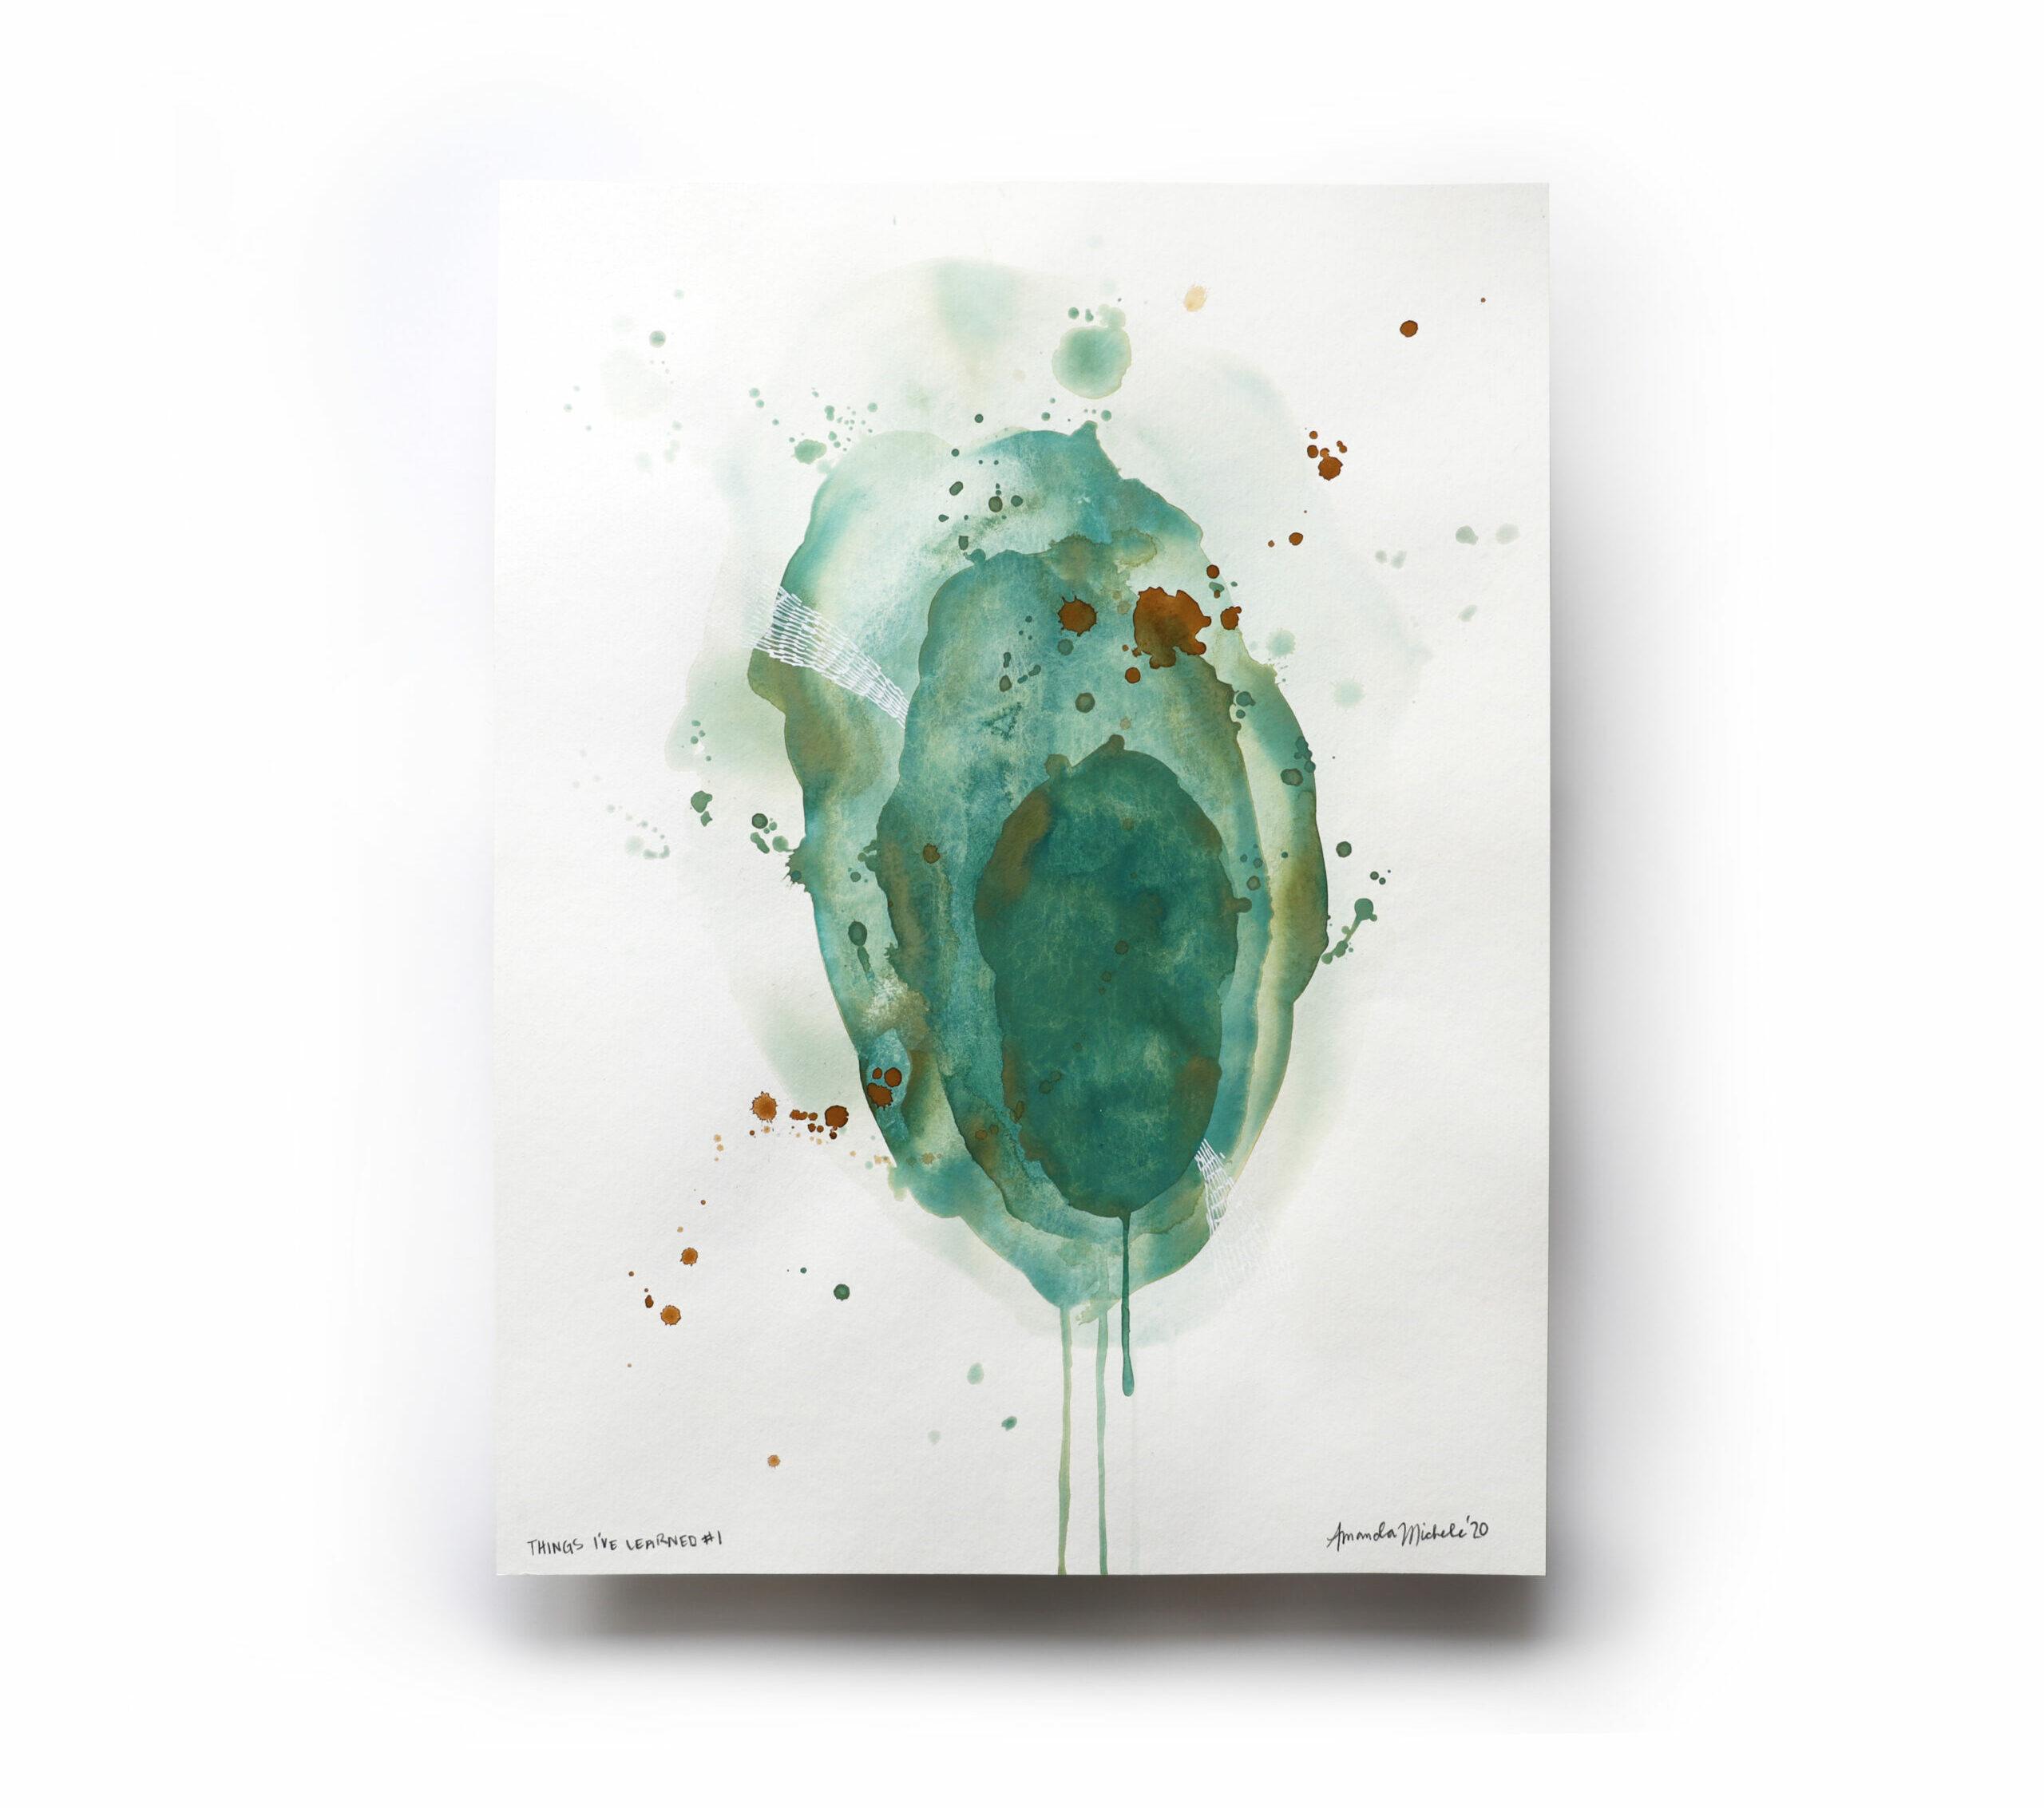 ThingsIveLearned1_float_medium - v